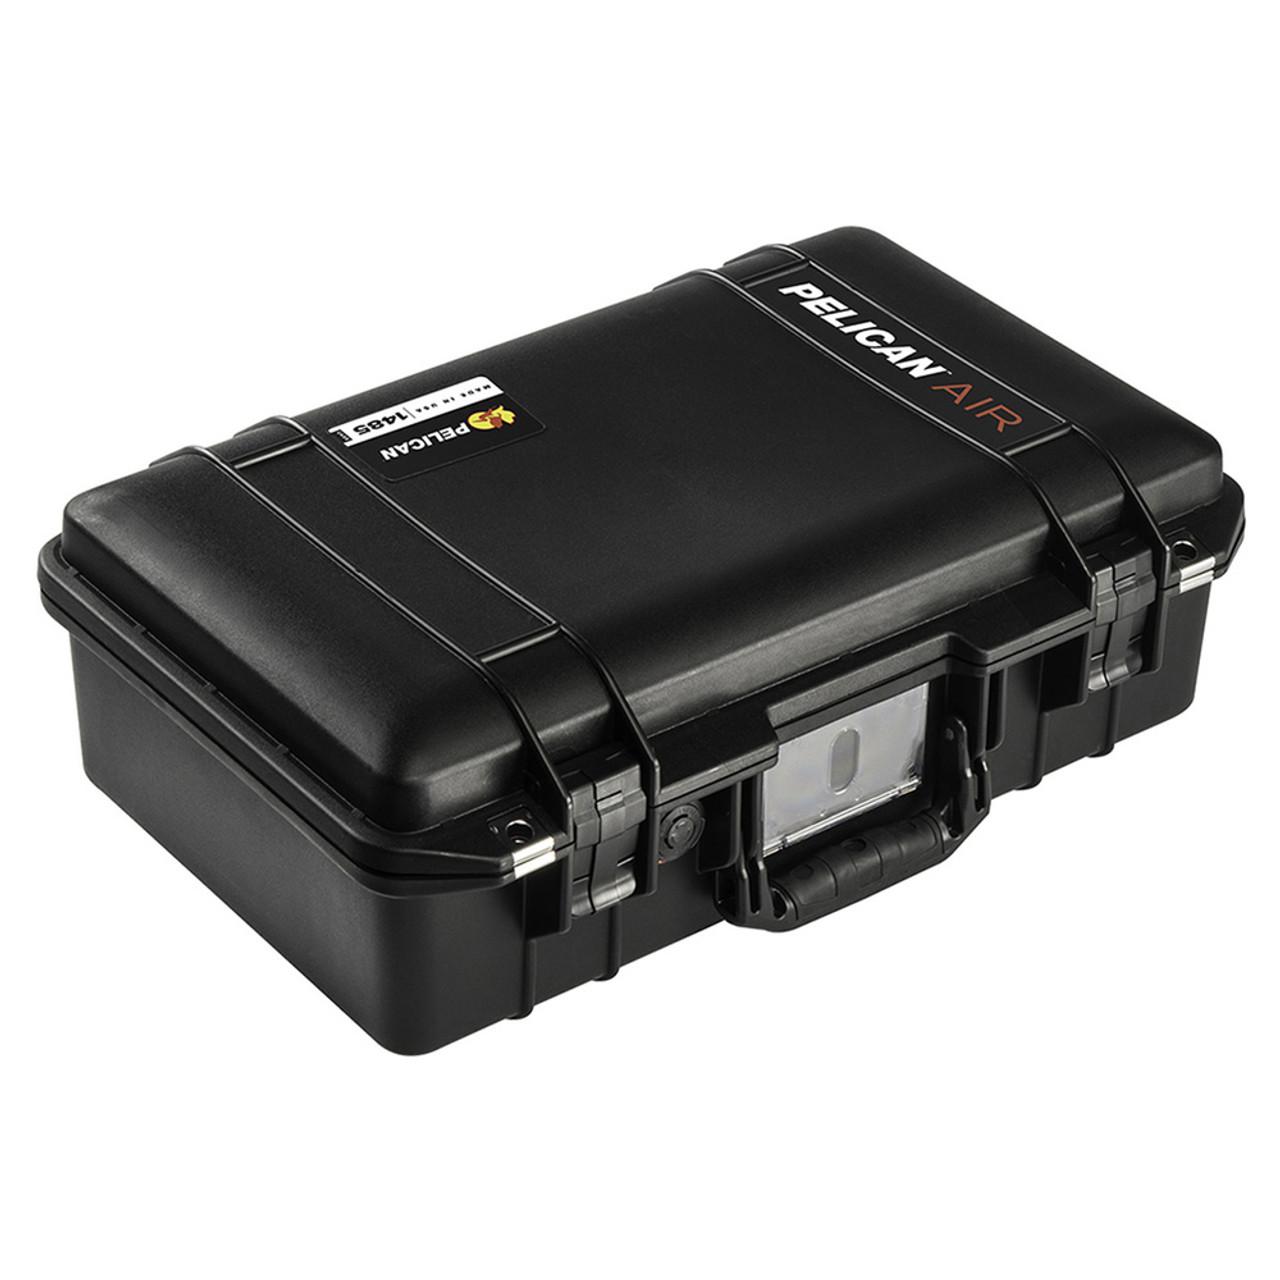 Black /& Yellow Pelican 1485 Air case with Trekpak dividers.